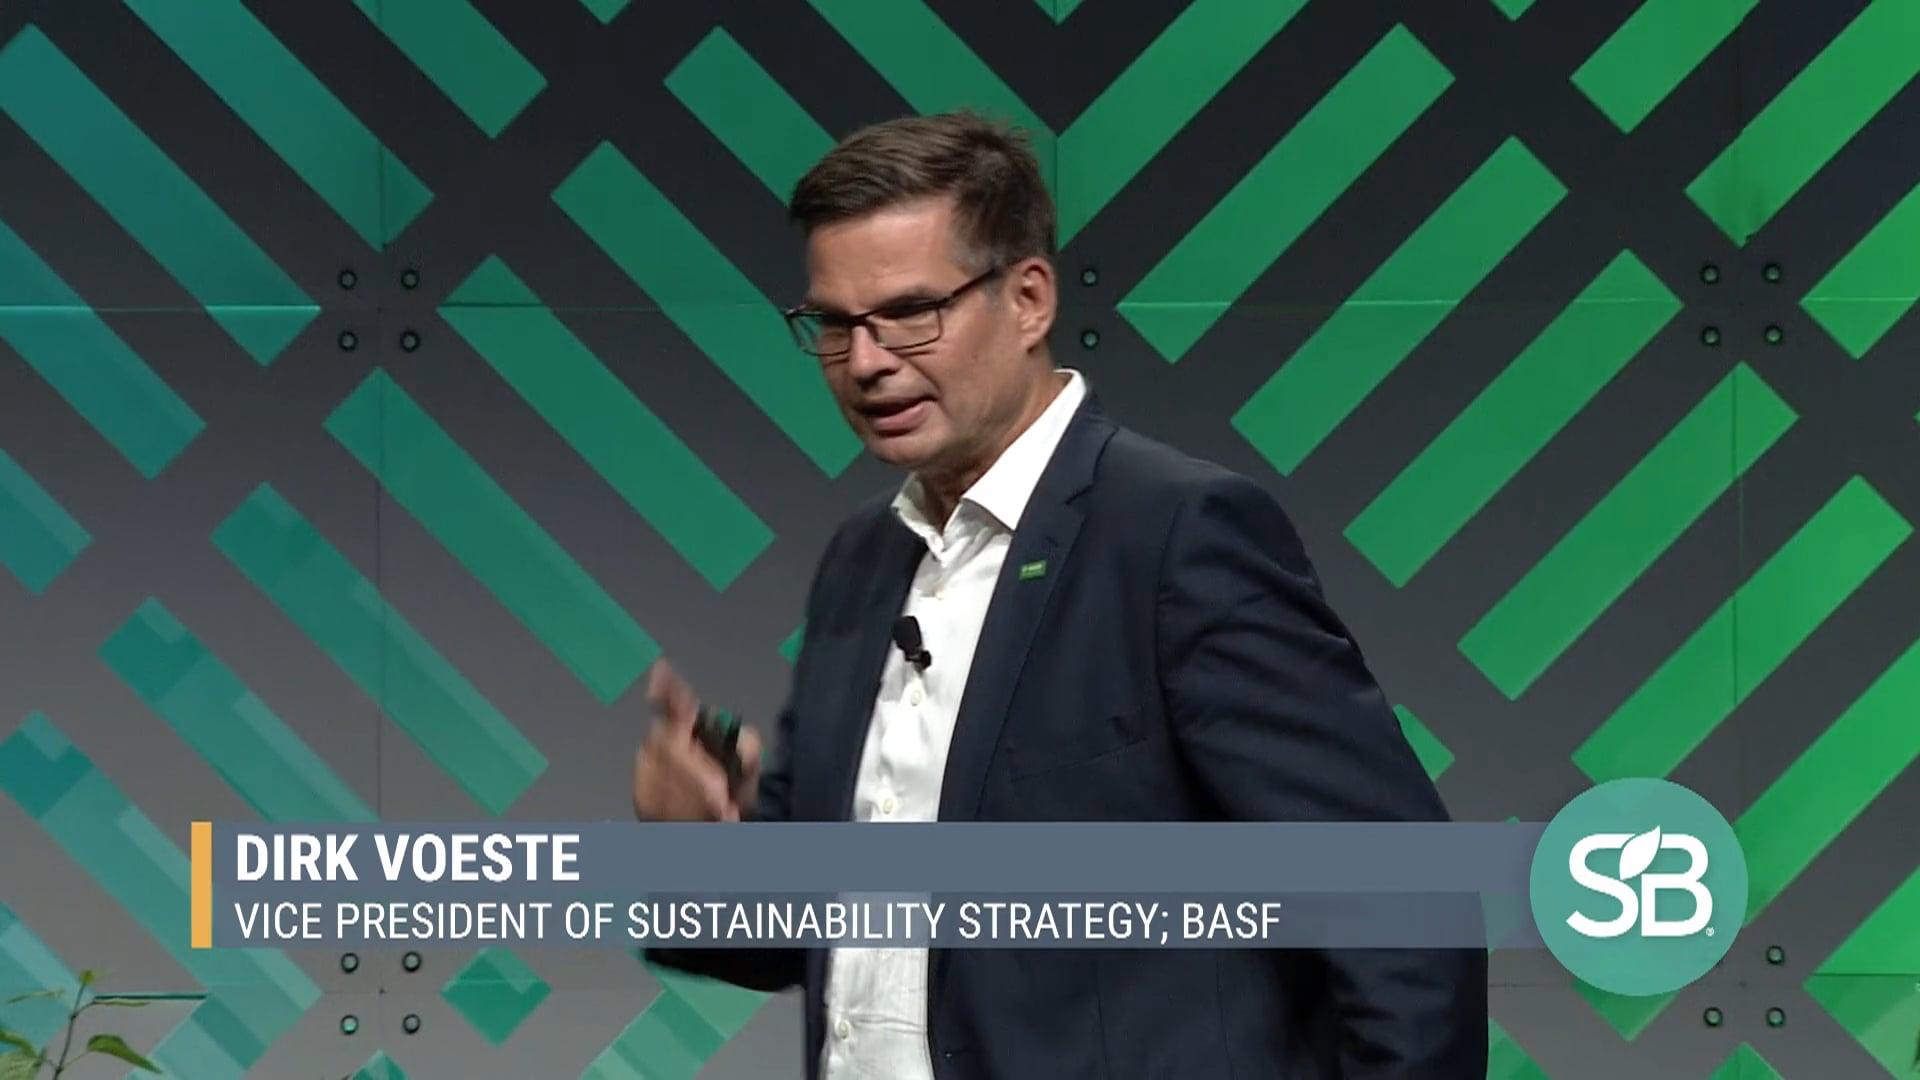 SB'19 Detroit Keynote / Dirk Voeste - Vice President of Sustainability Strategy, BASF